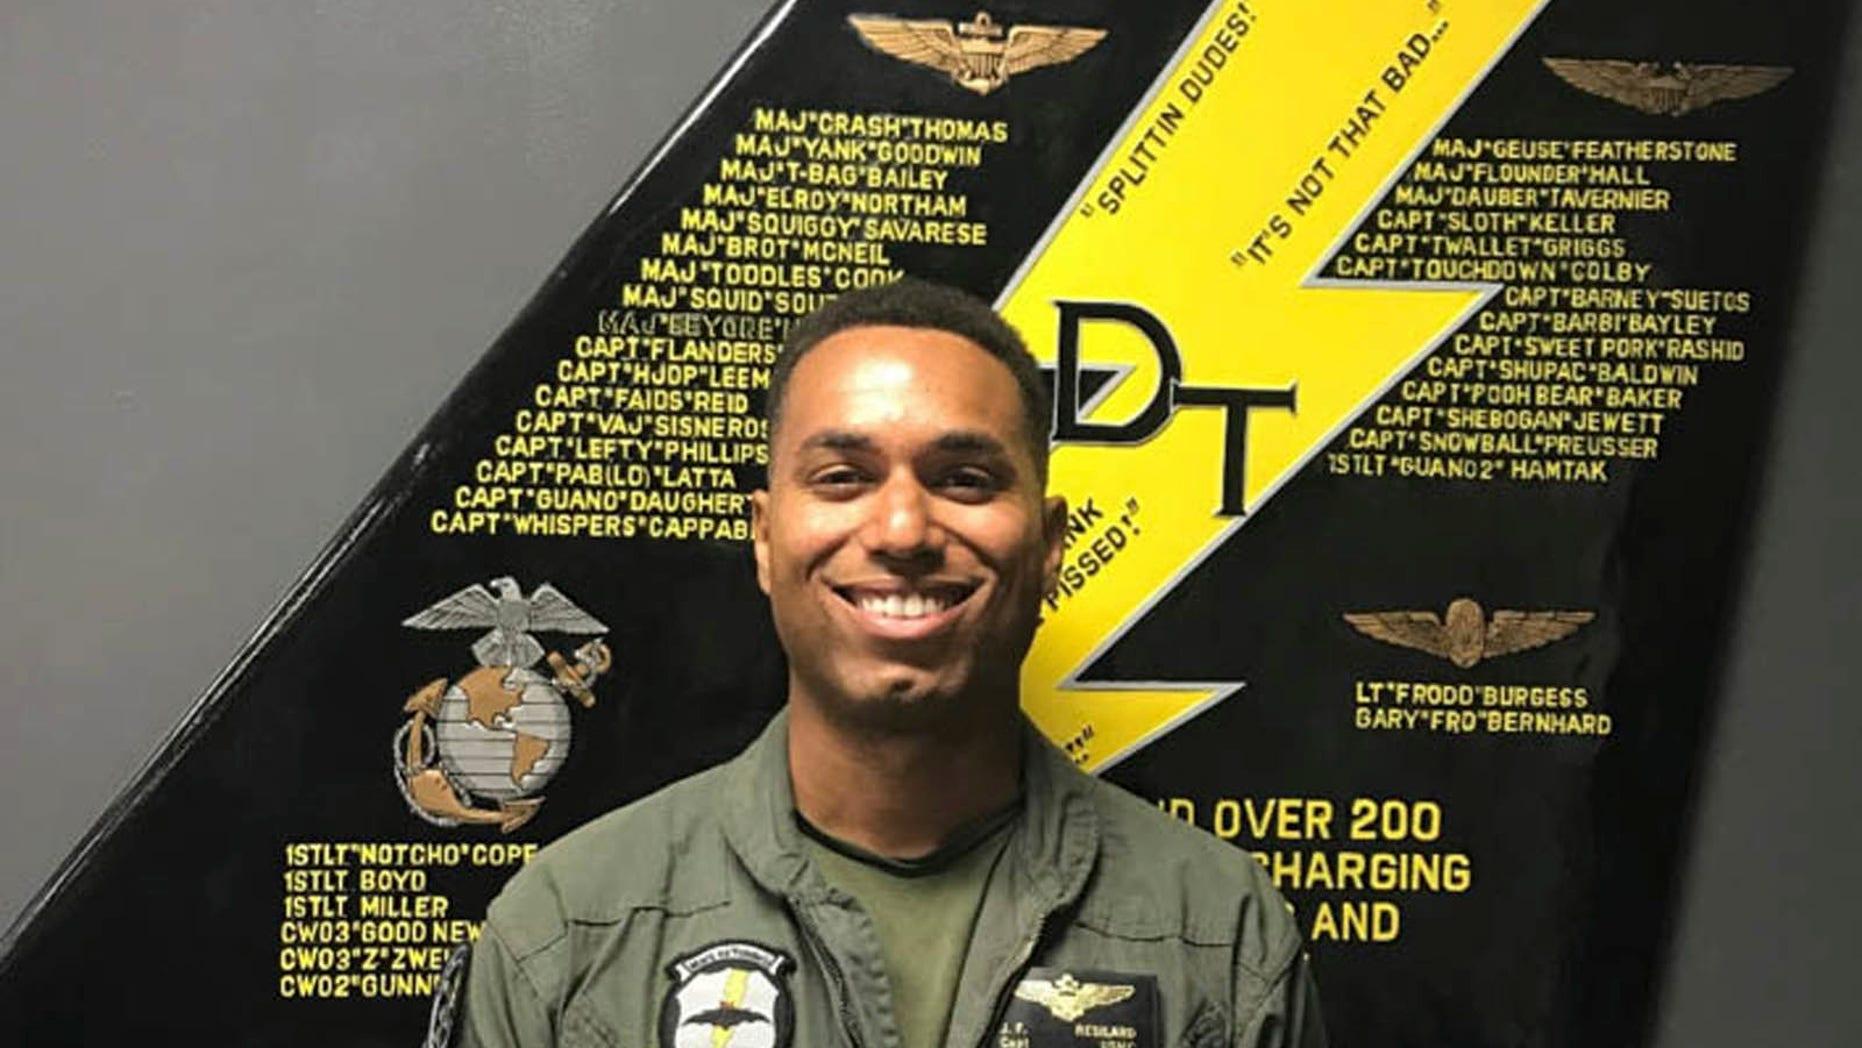 Marine from Miramar, Florida, killed in military crash